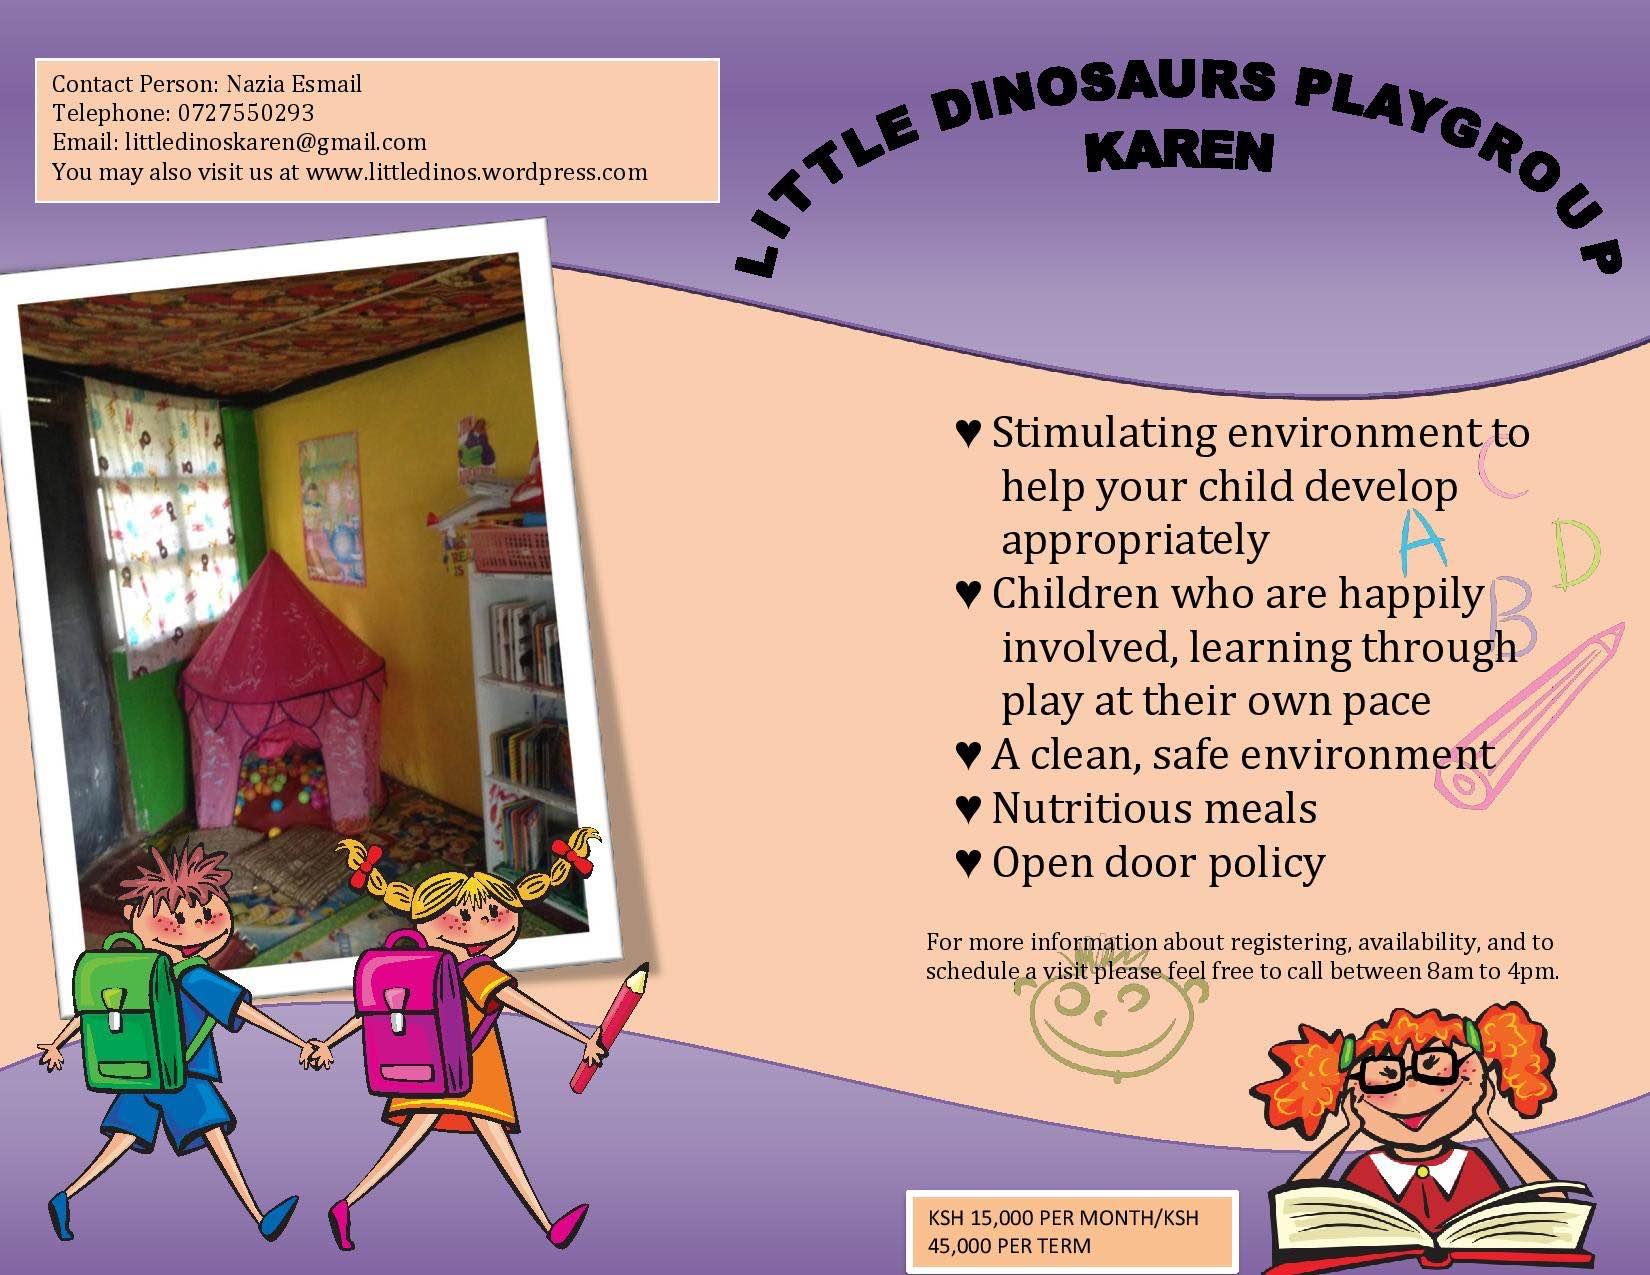 Little Dinosaurs Playgroup